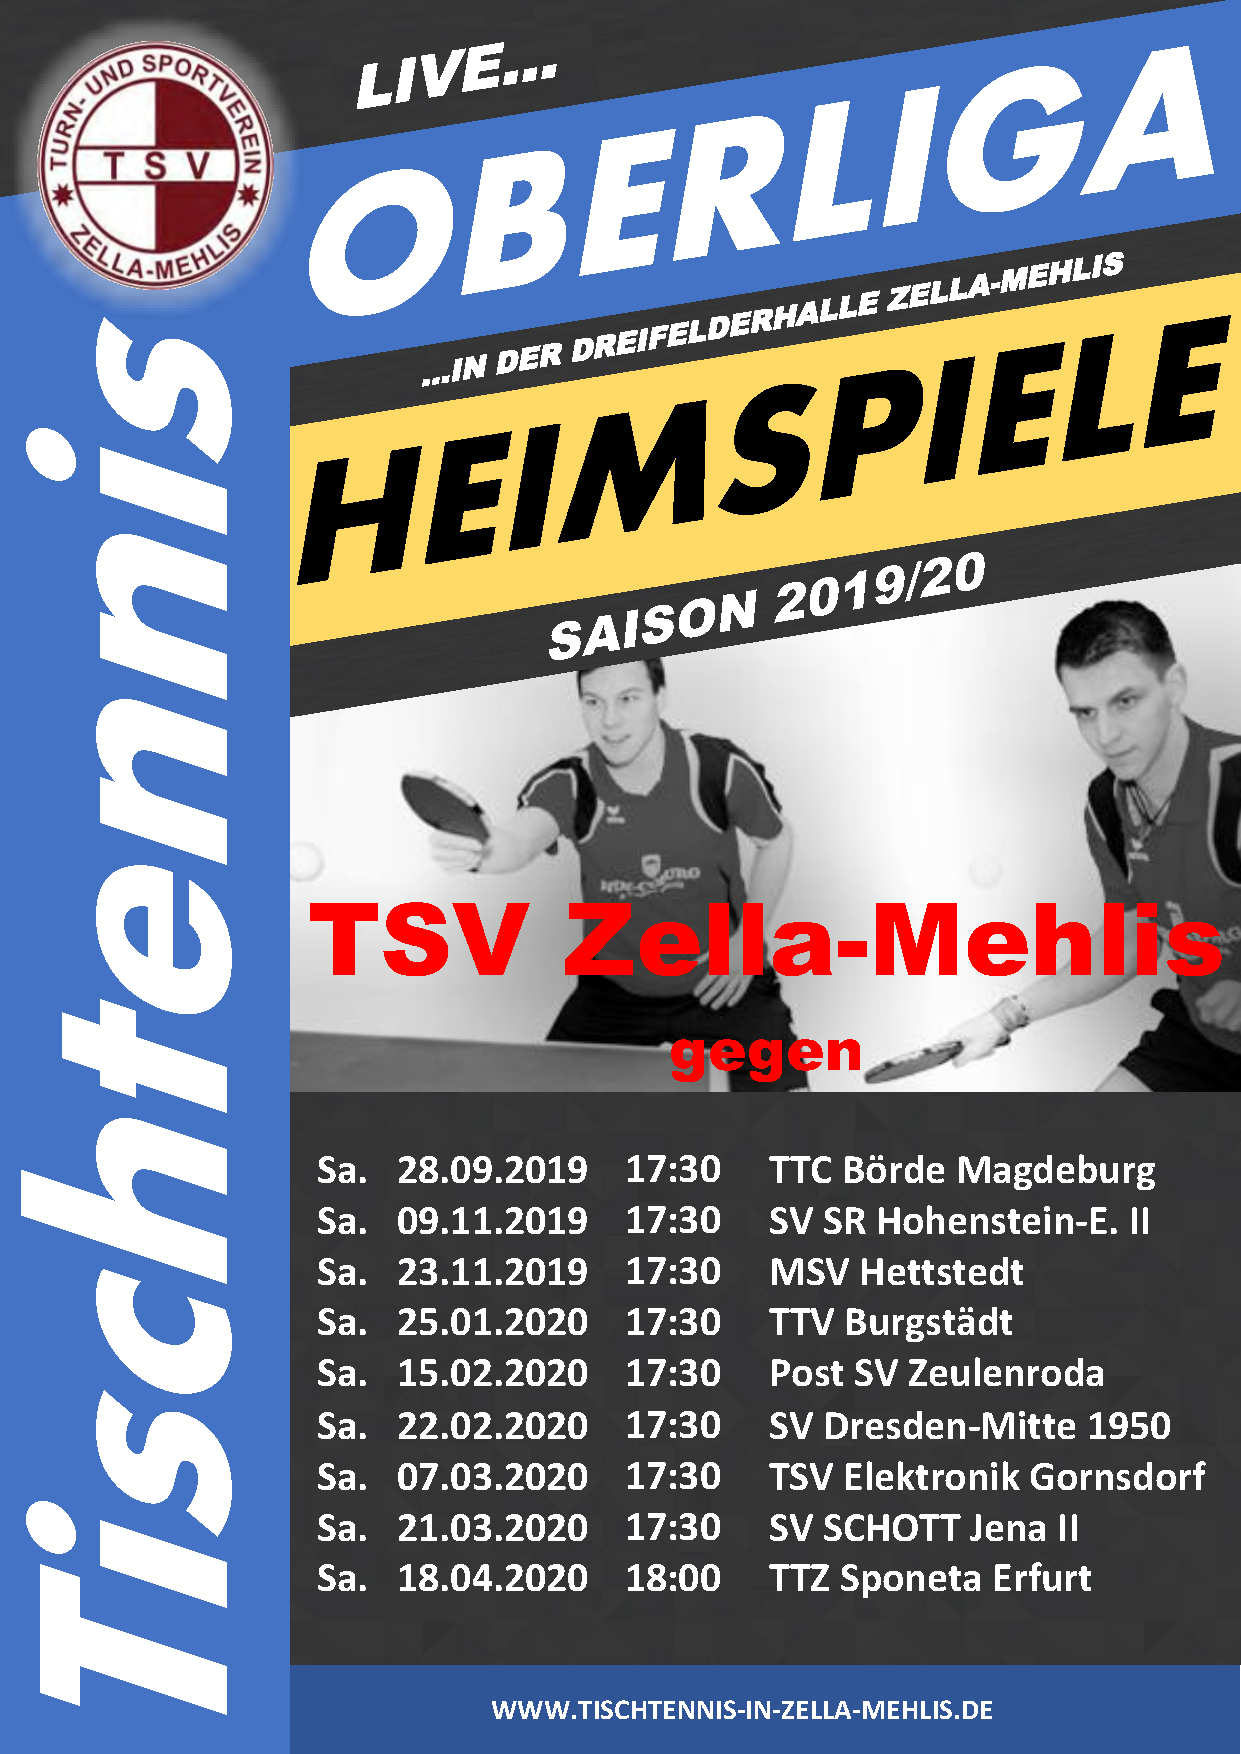 plakat_Oberliga_Heimspiele - Test Neu2020--groese